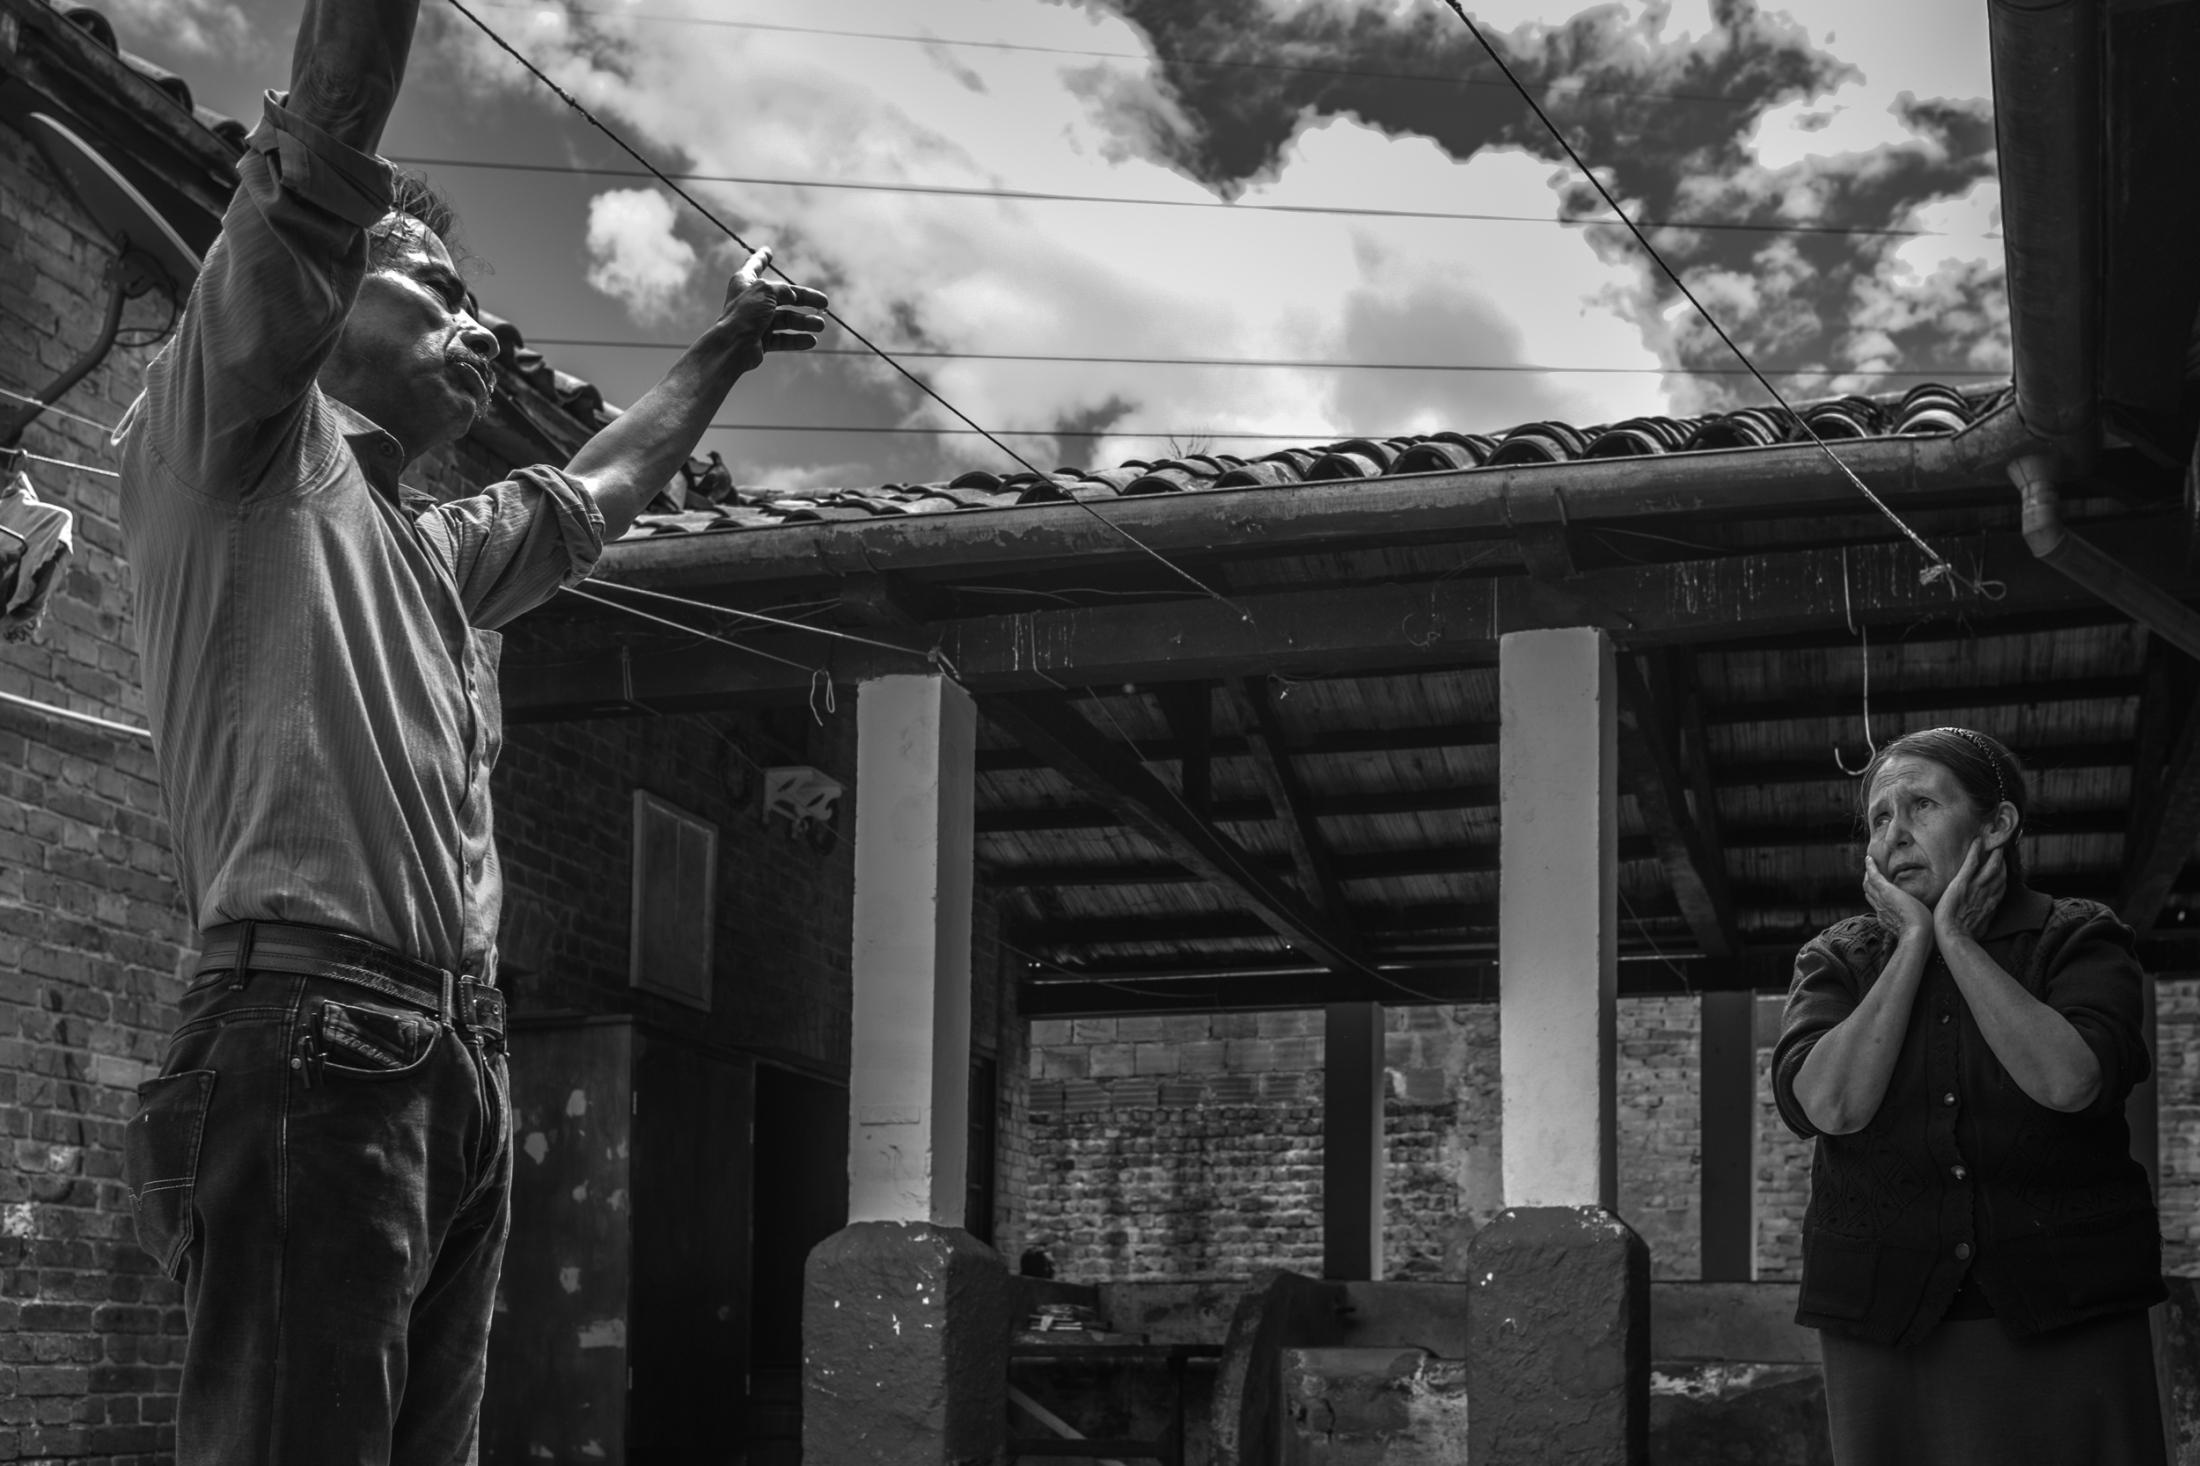 Art and Documentary Photography - Loading ZuletaR__os_CarangasYElJaguar_010.JPG